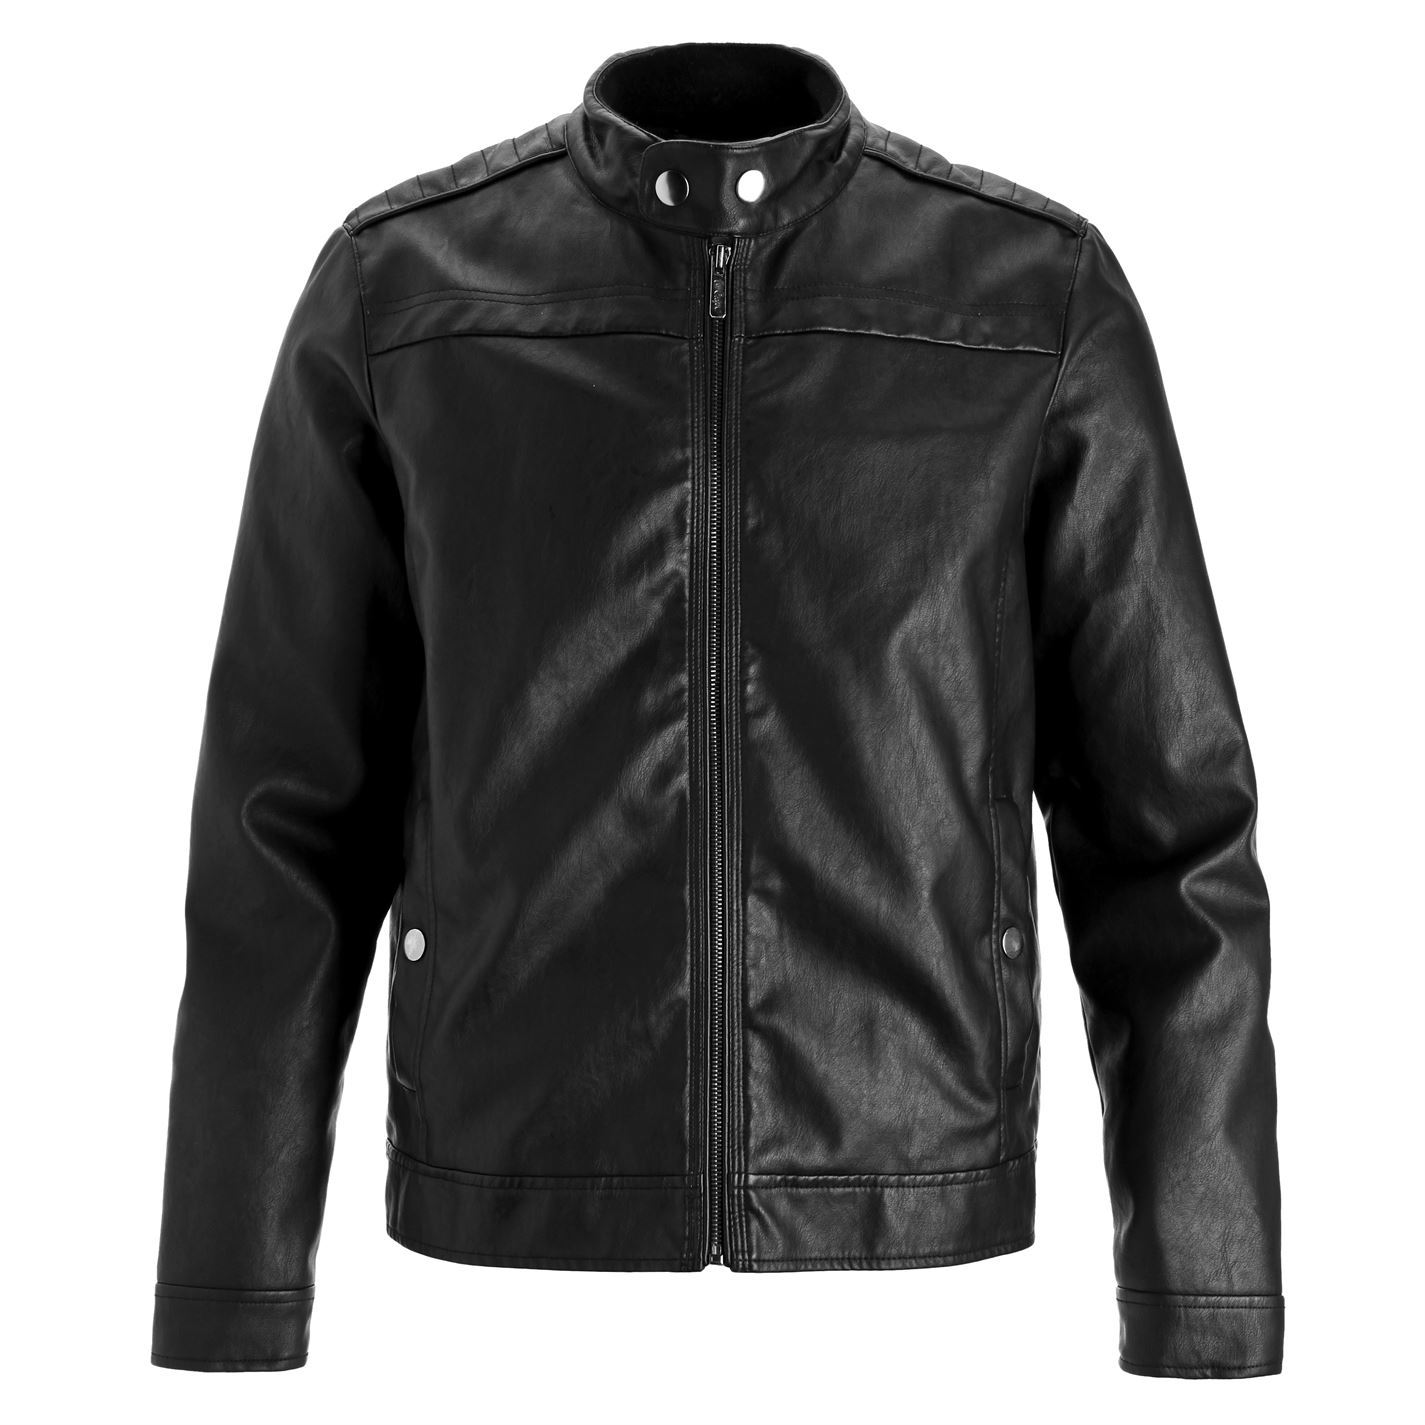 Lee Cooper Classic PU Jacket Mens Black Coat Outerwear | EBay